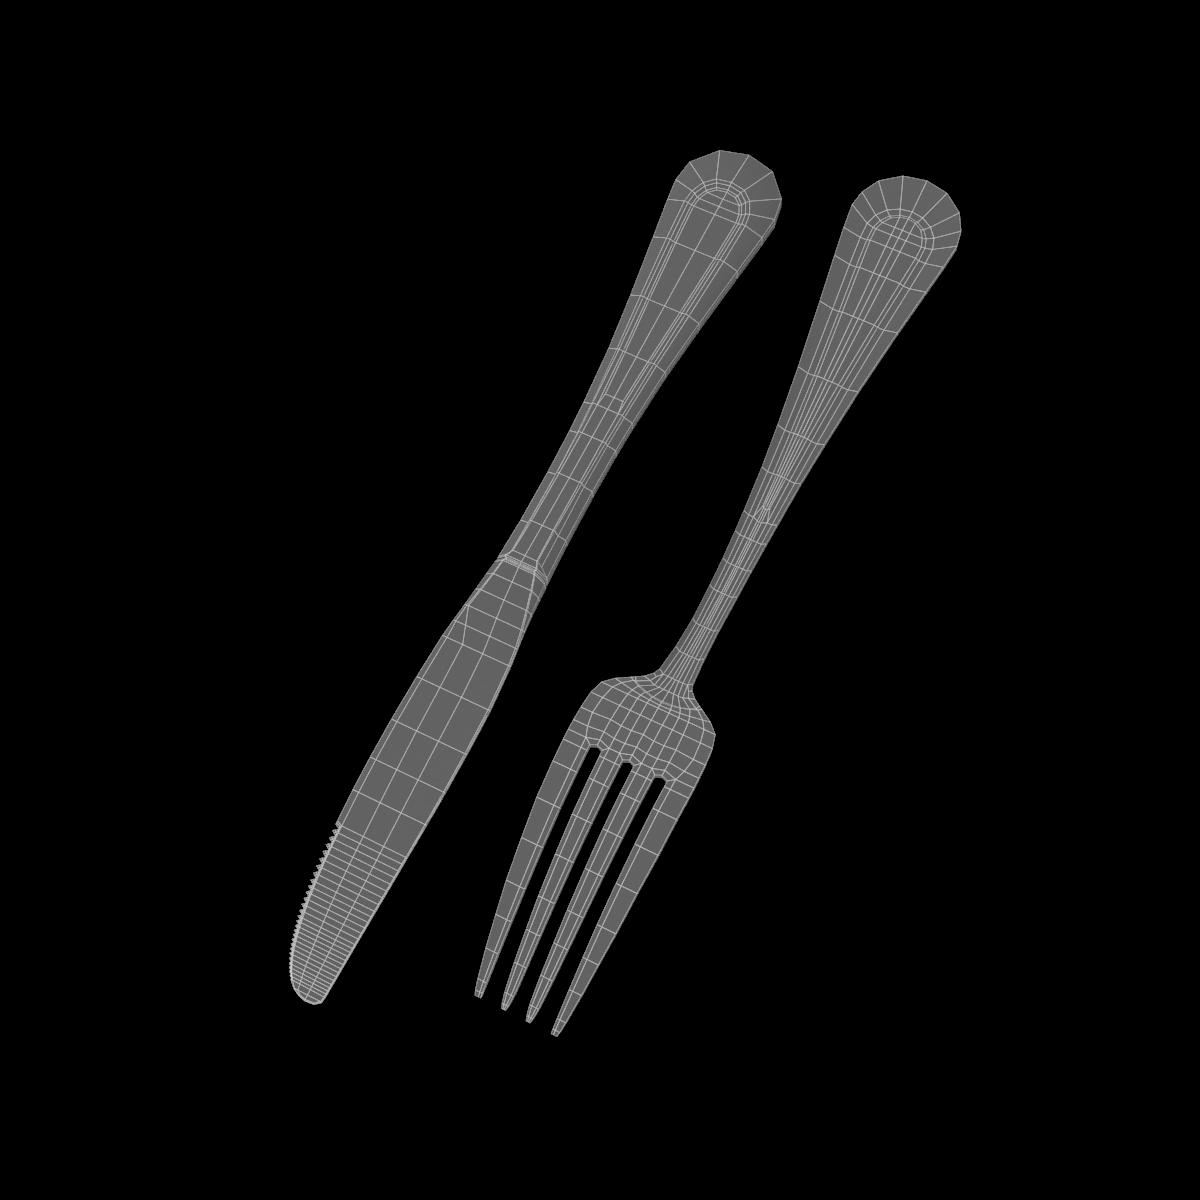 dessert knife and fork classic cutlery 3d model 3ds c4d fbx max max ma mb obj txt png stl 285938